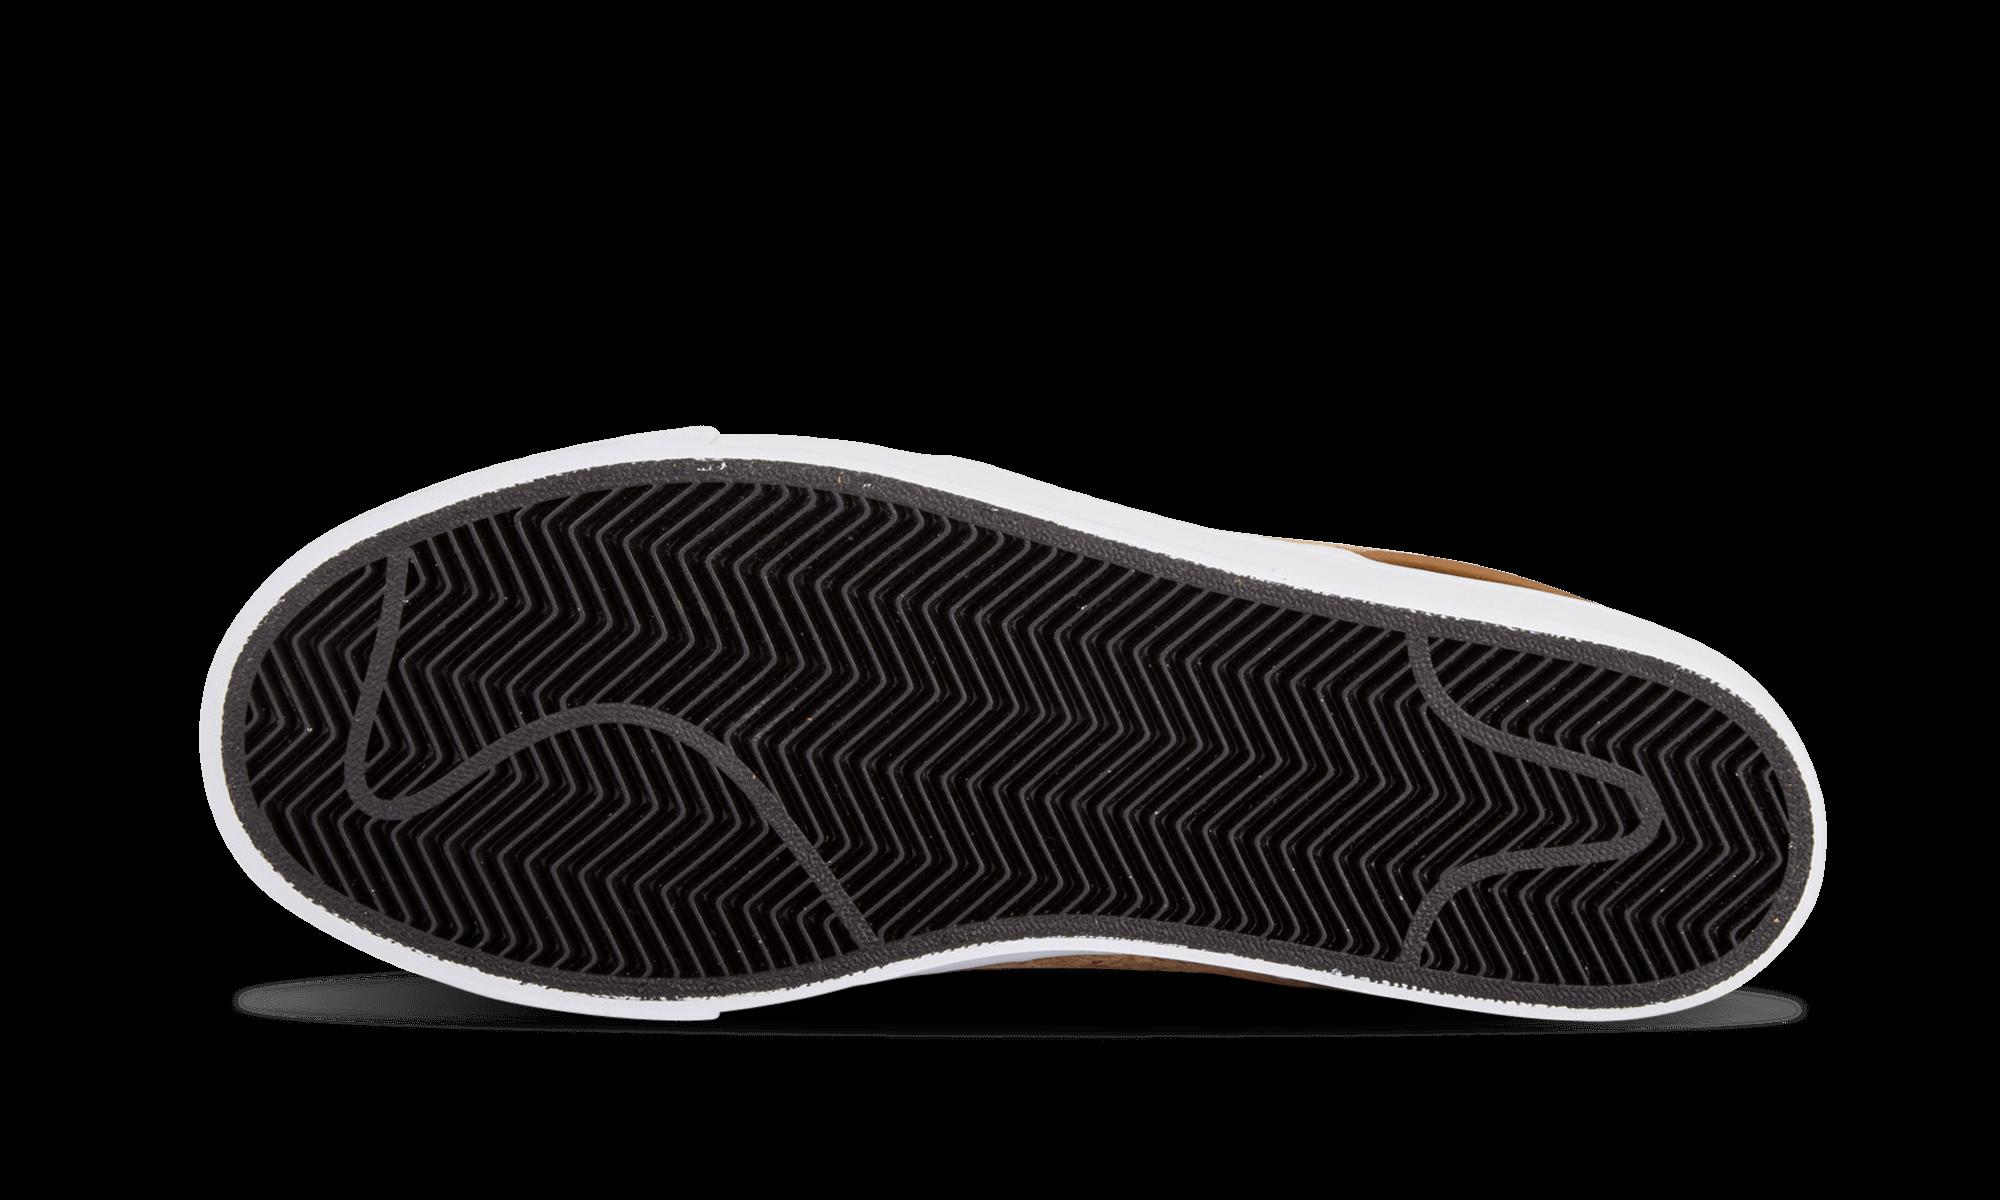 Nike zoom stefan janoski elite cork2